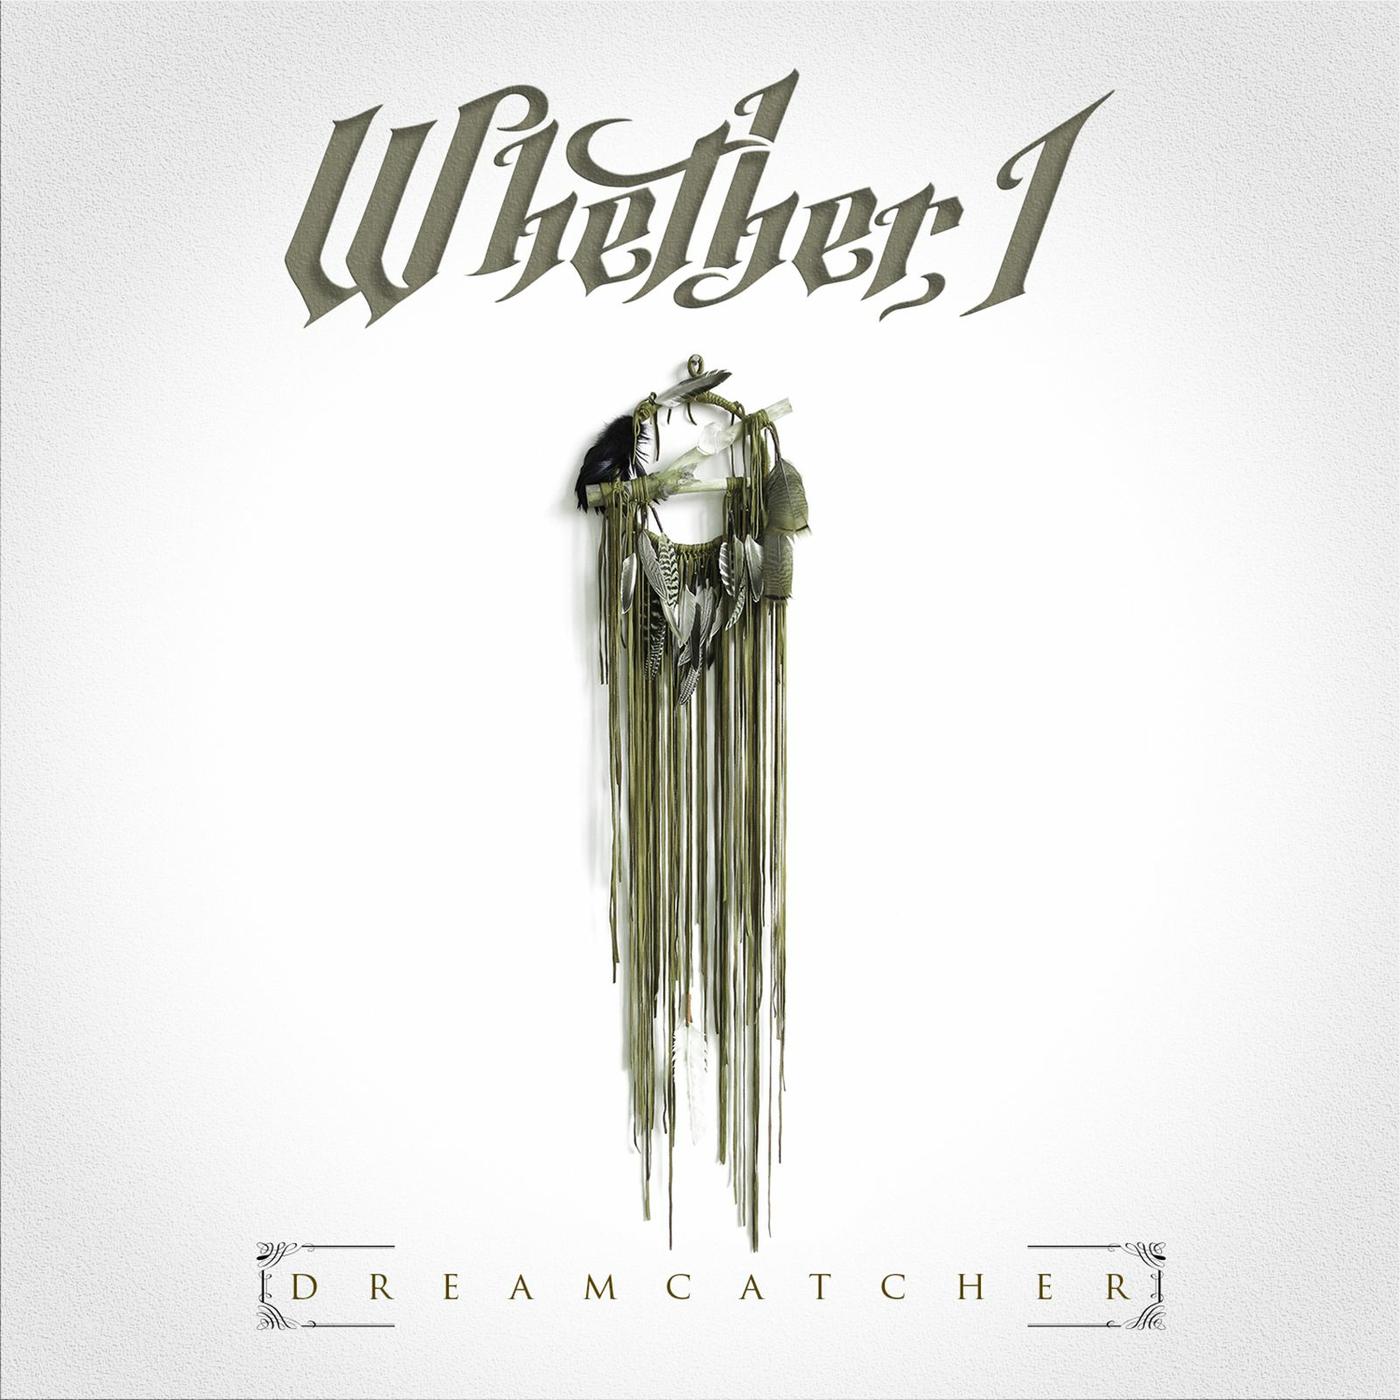 Whether, I - Dreamcatcher [EP] (2014)